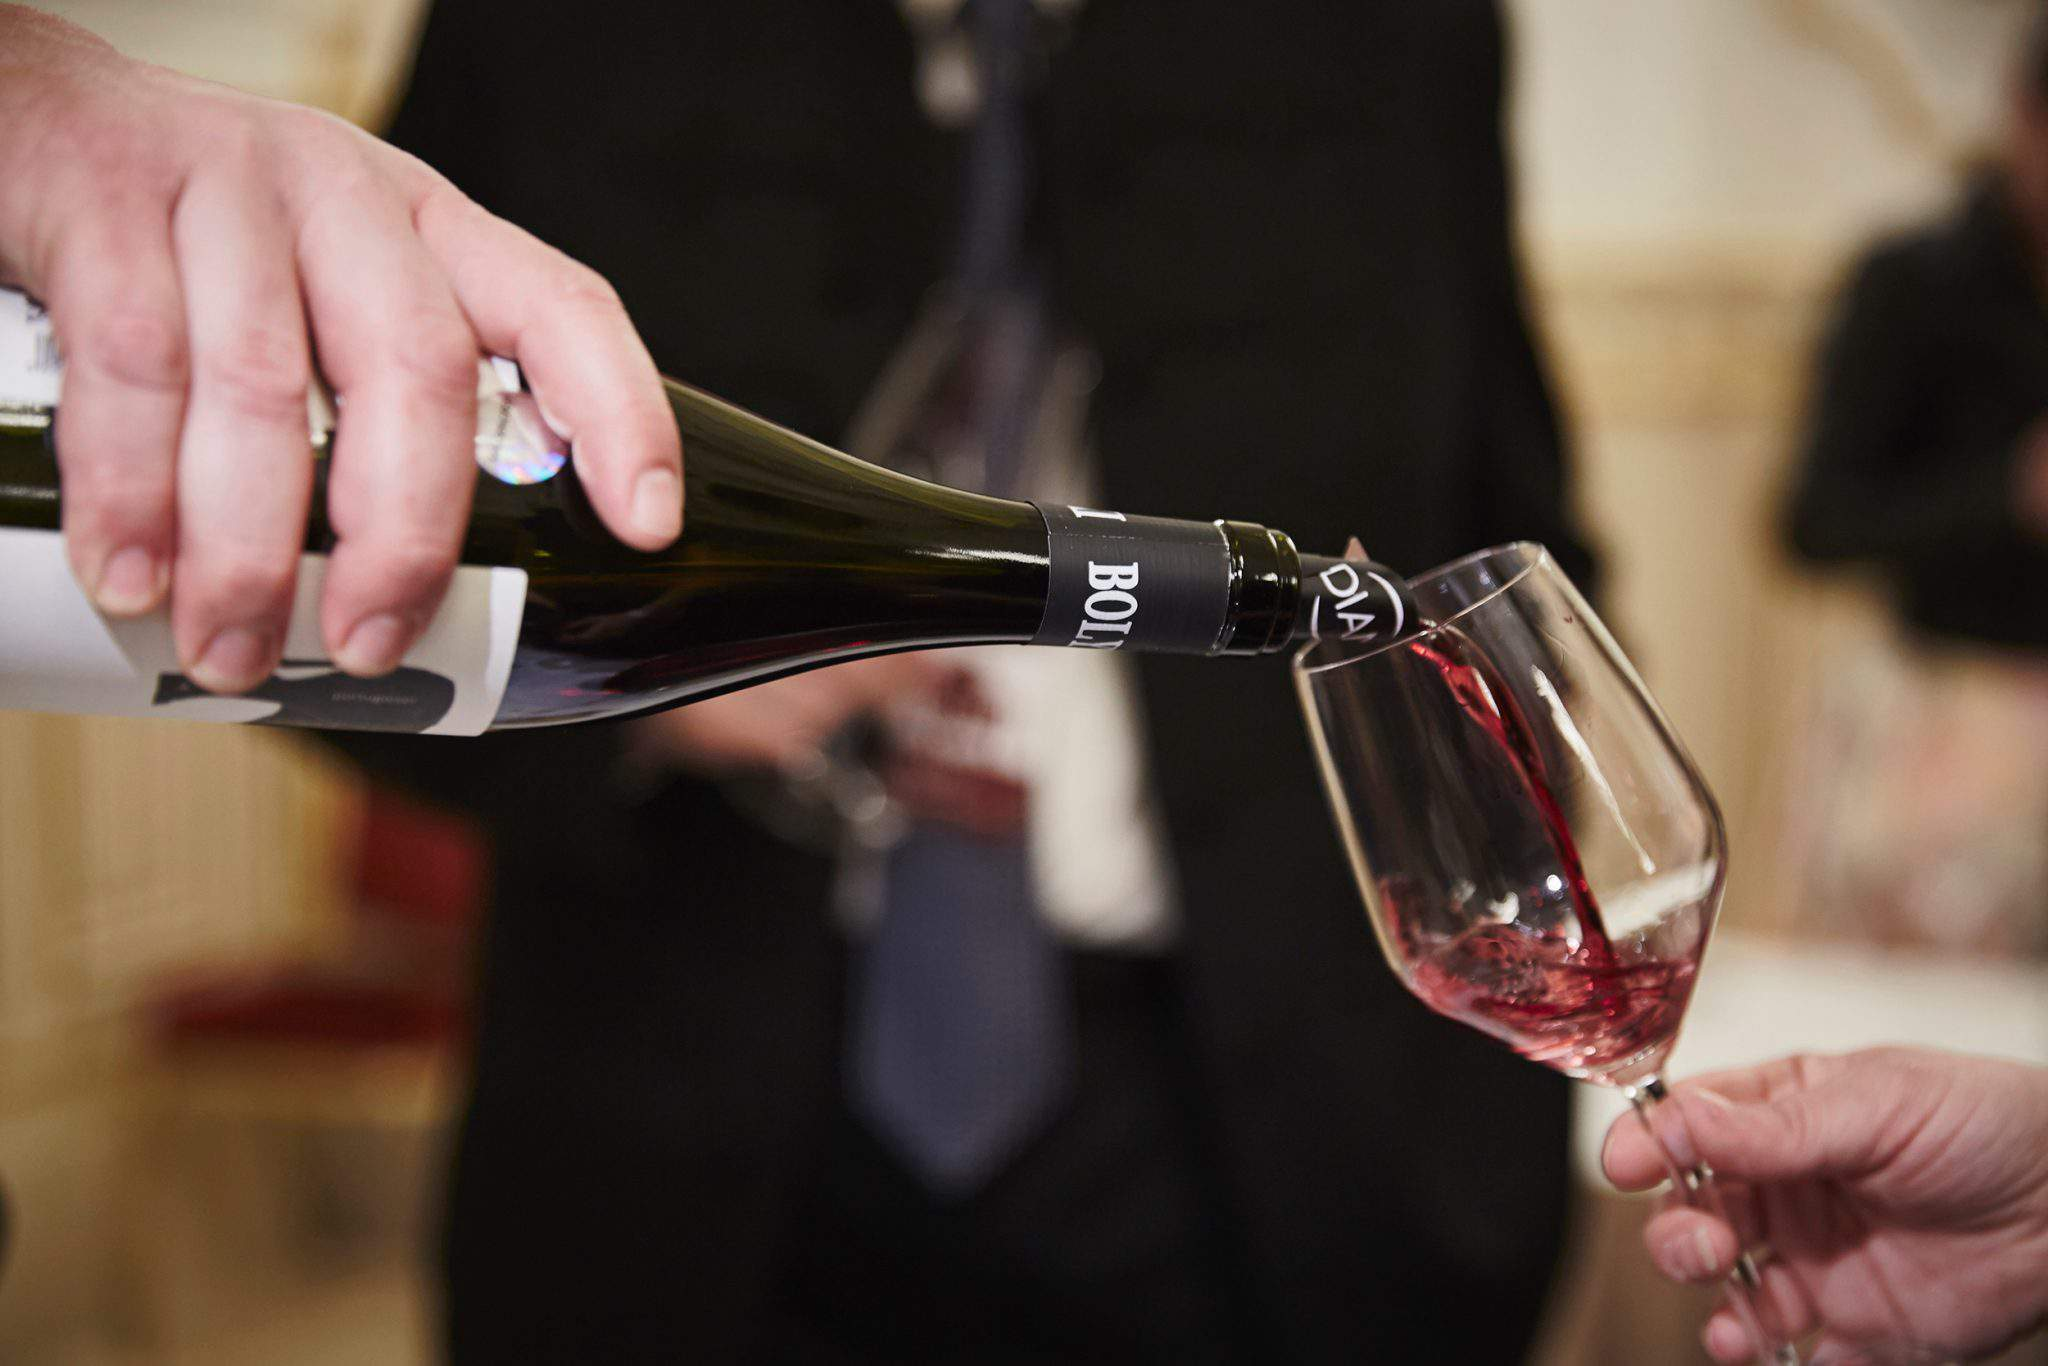 bikaverparbaj bikavér bikaver wine bor hosting alcohol